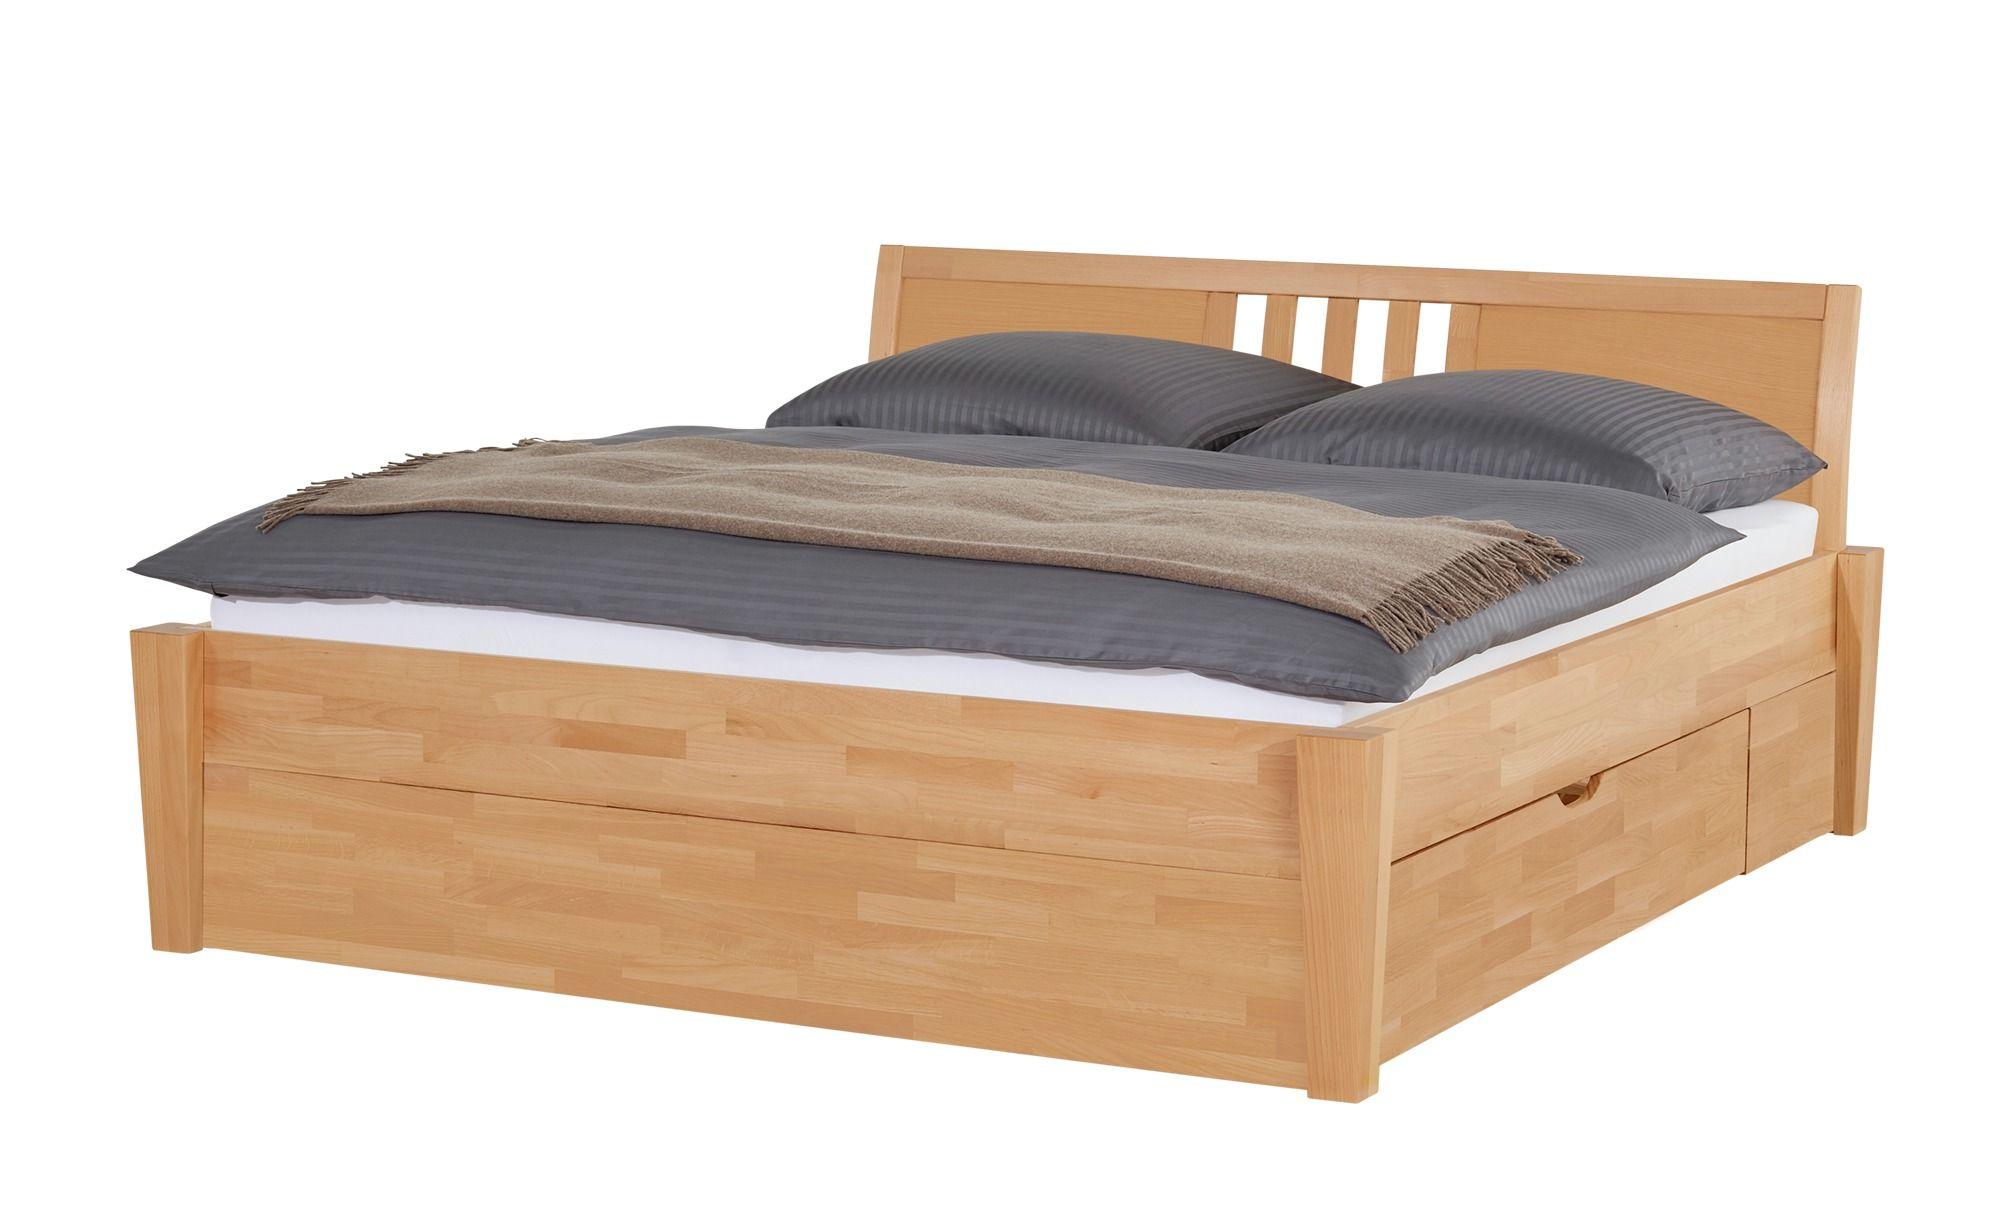 Massivholz Bettgestell Timber Gefunden Bei Mobel Hoffner Bettgestell Hausmobel Und Holzfarben